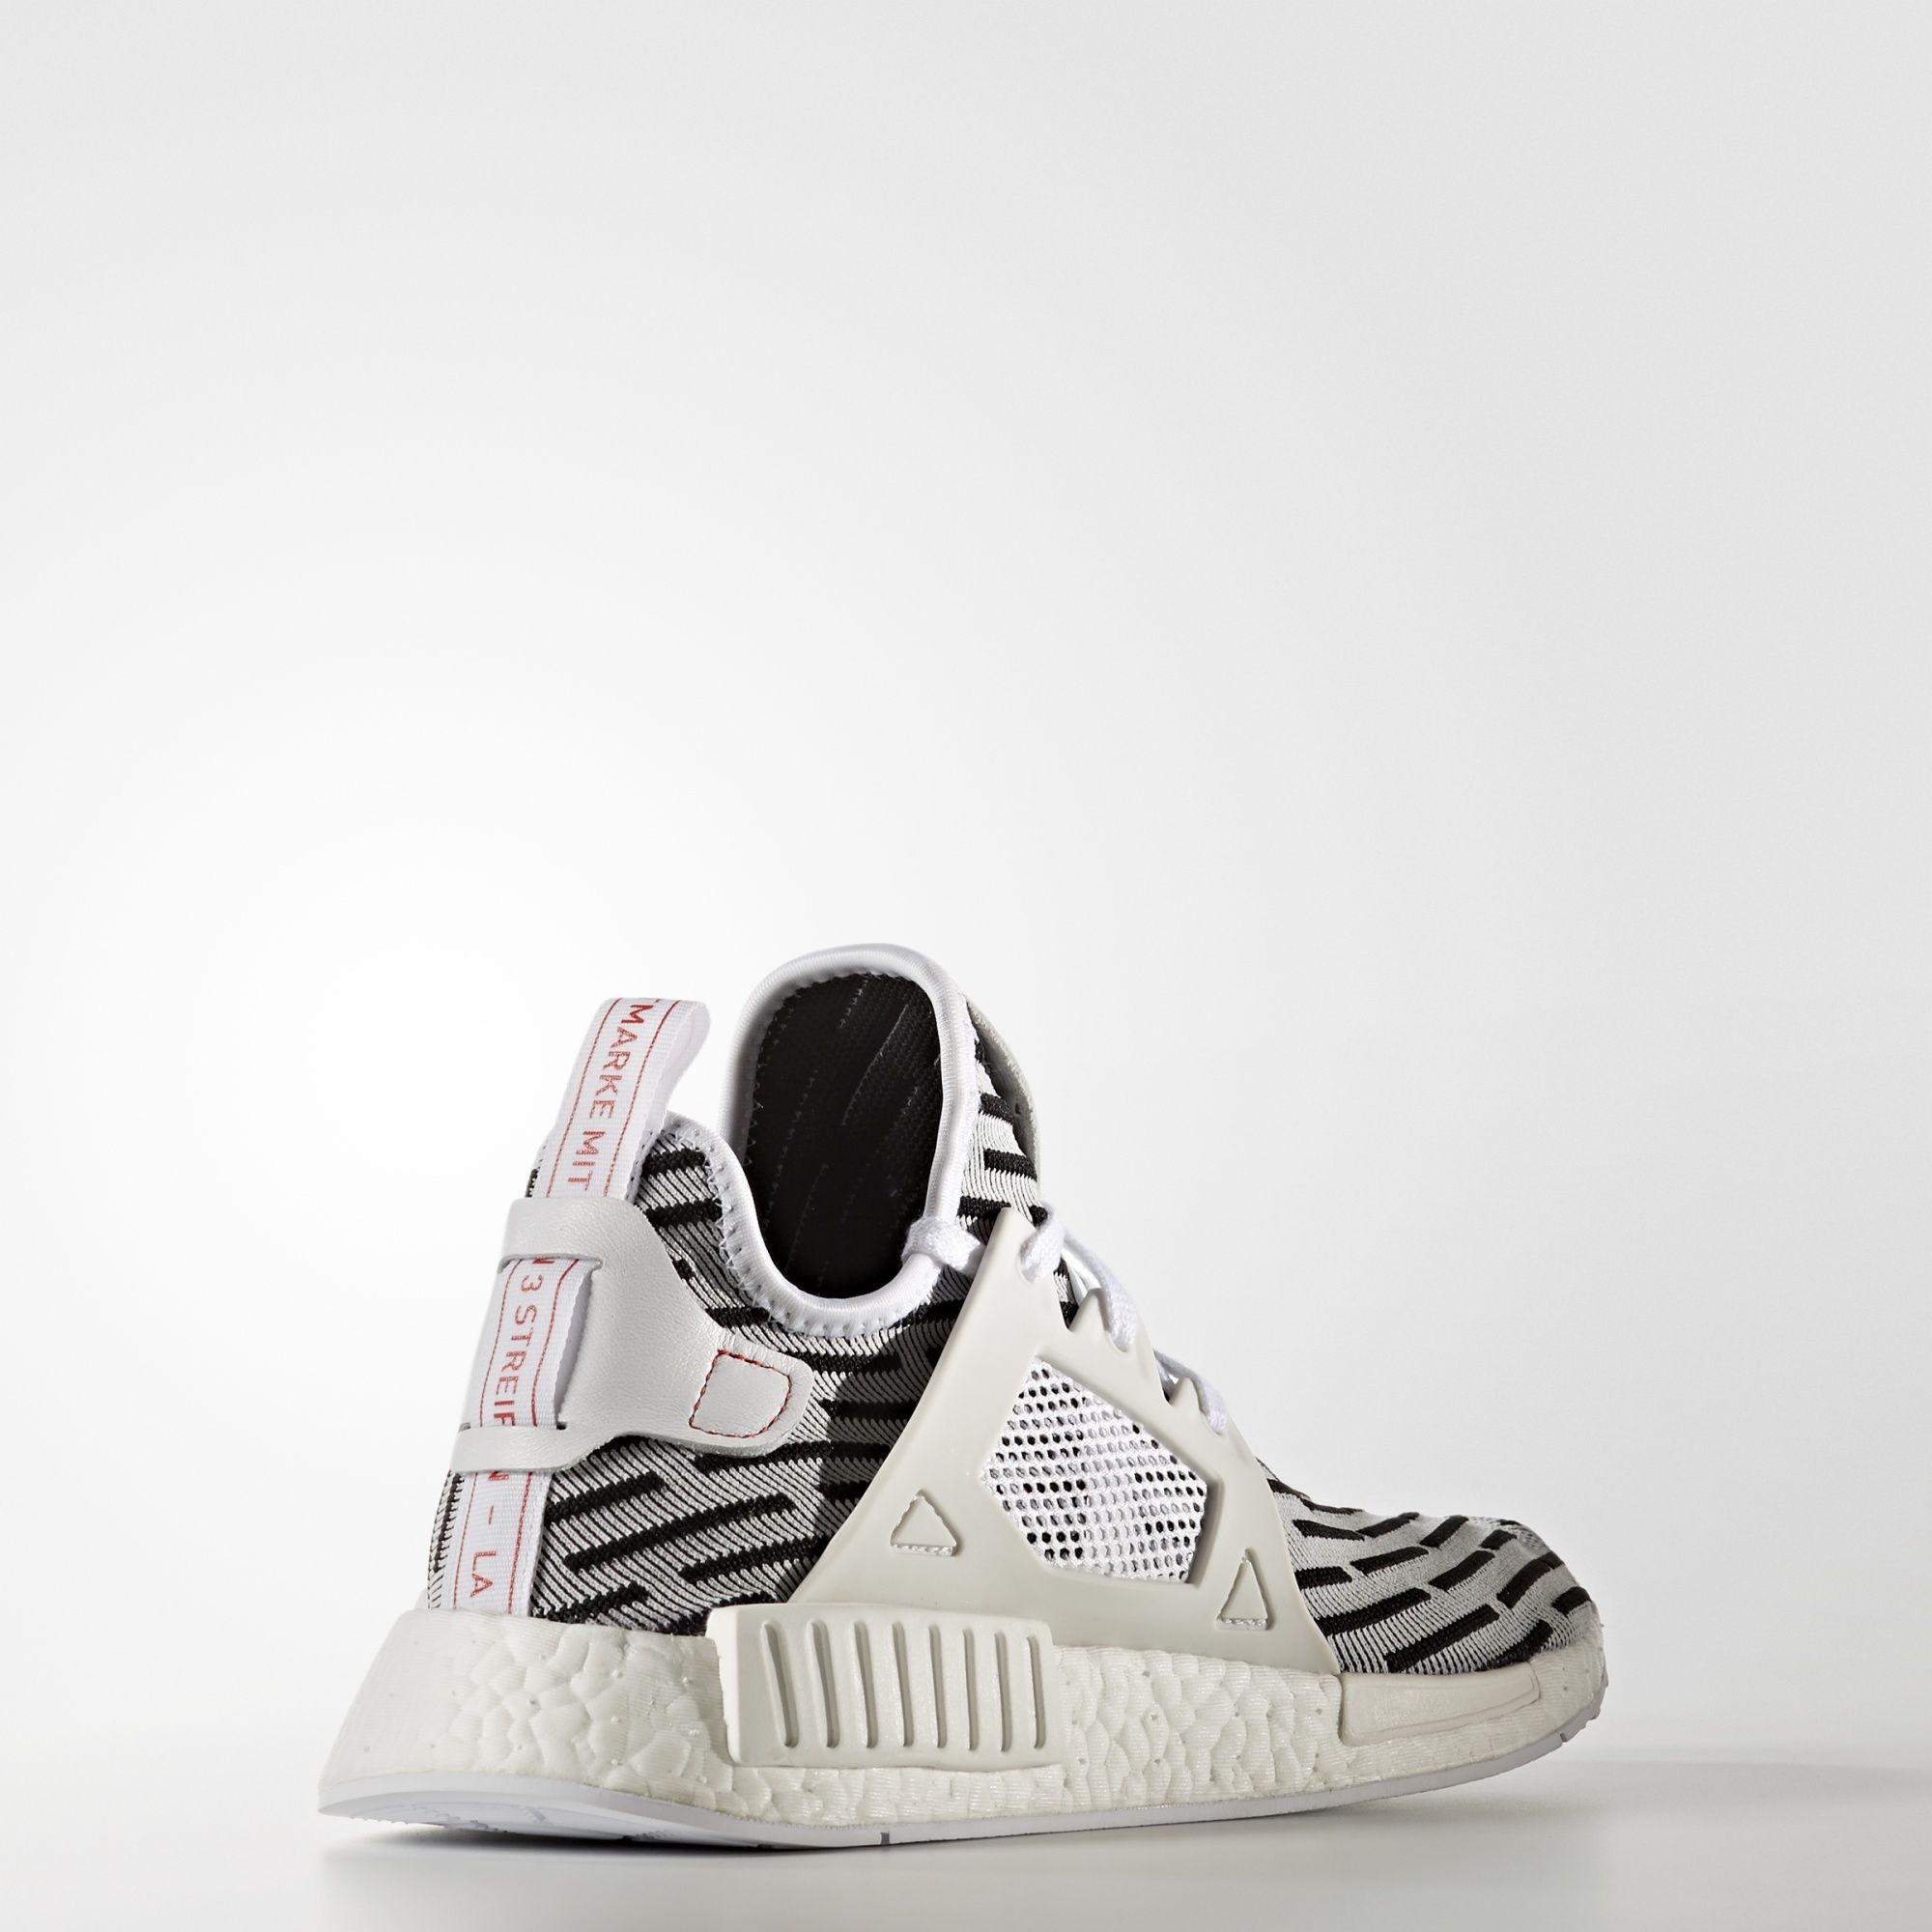 adidas NMD XR1 Primeknit Zebra BB2911 3